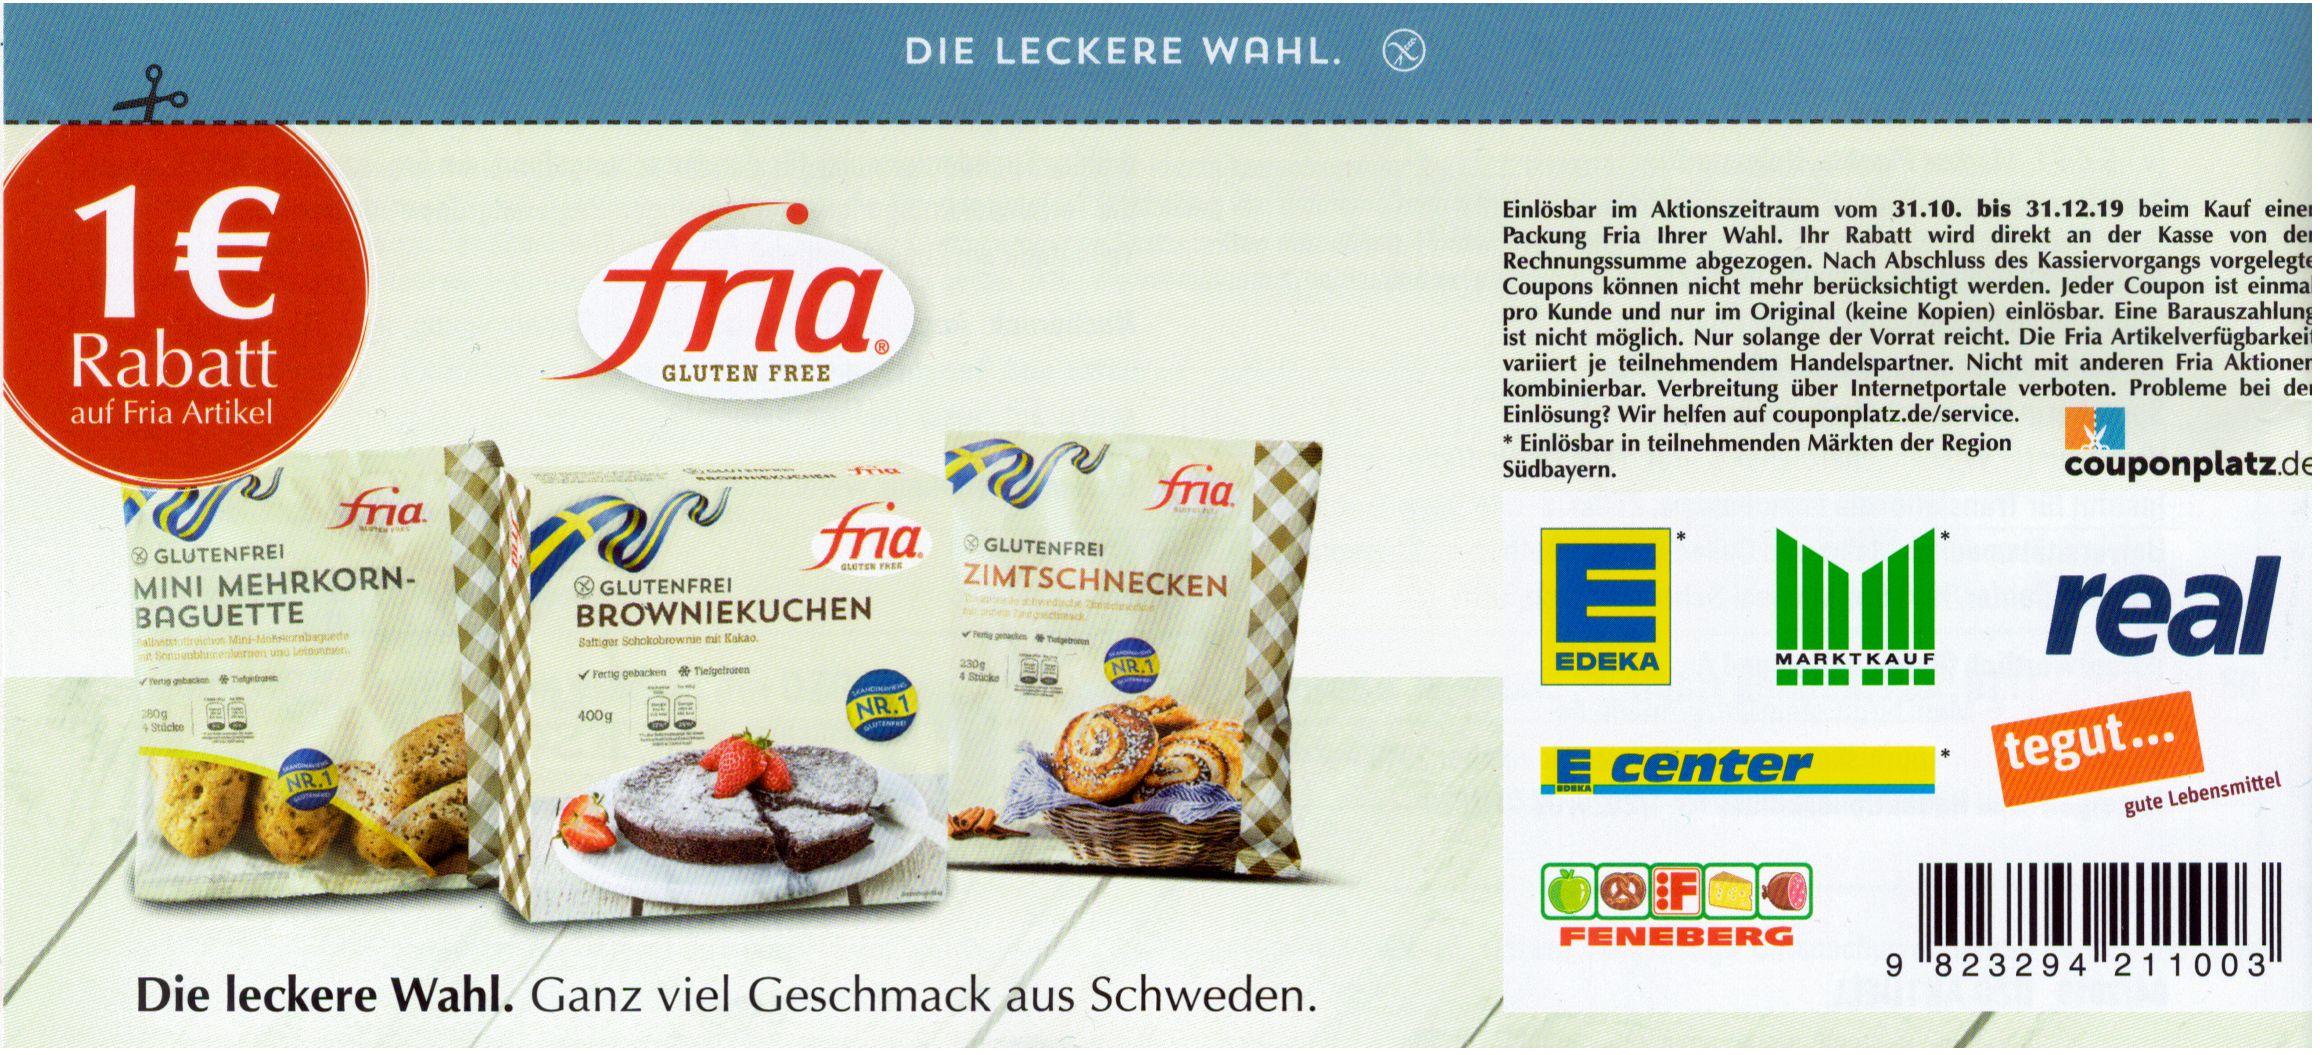 [glutenfrei] Fria gluten free 1€ Rabatt